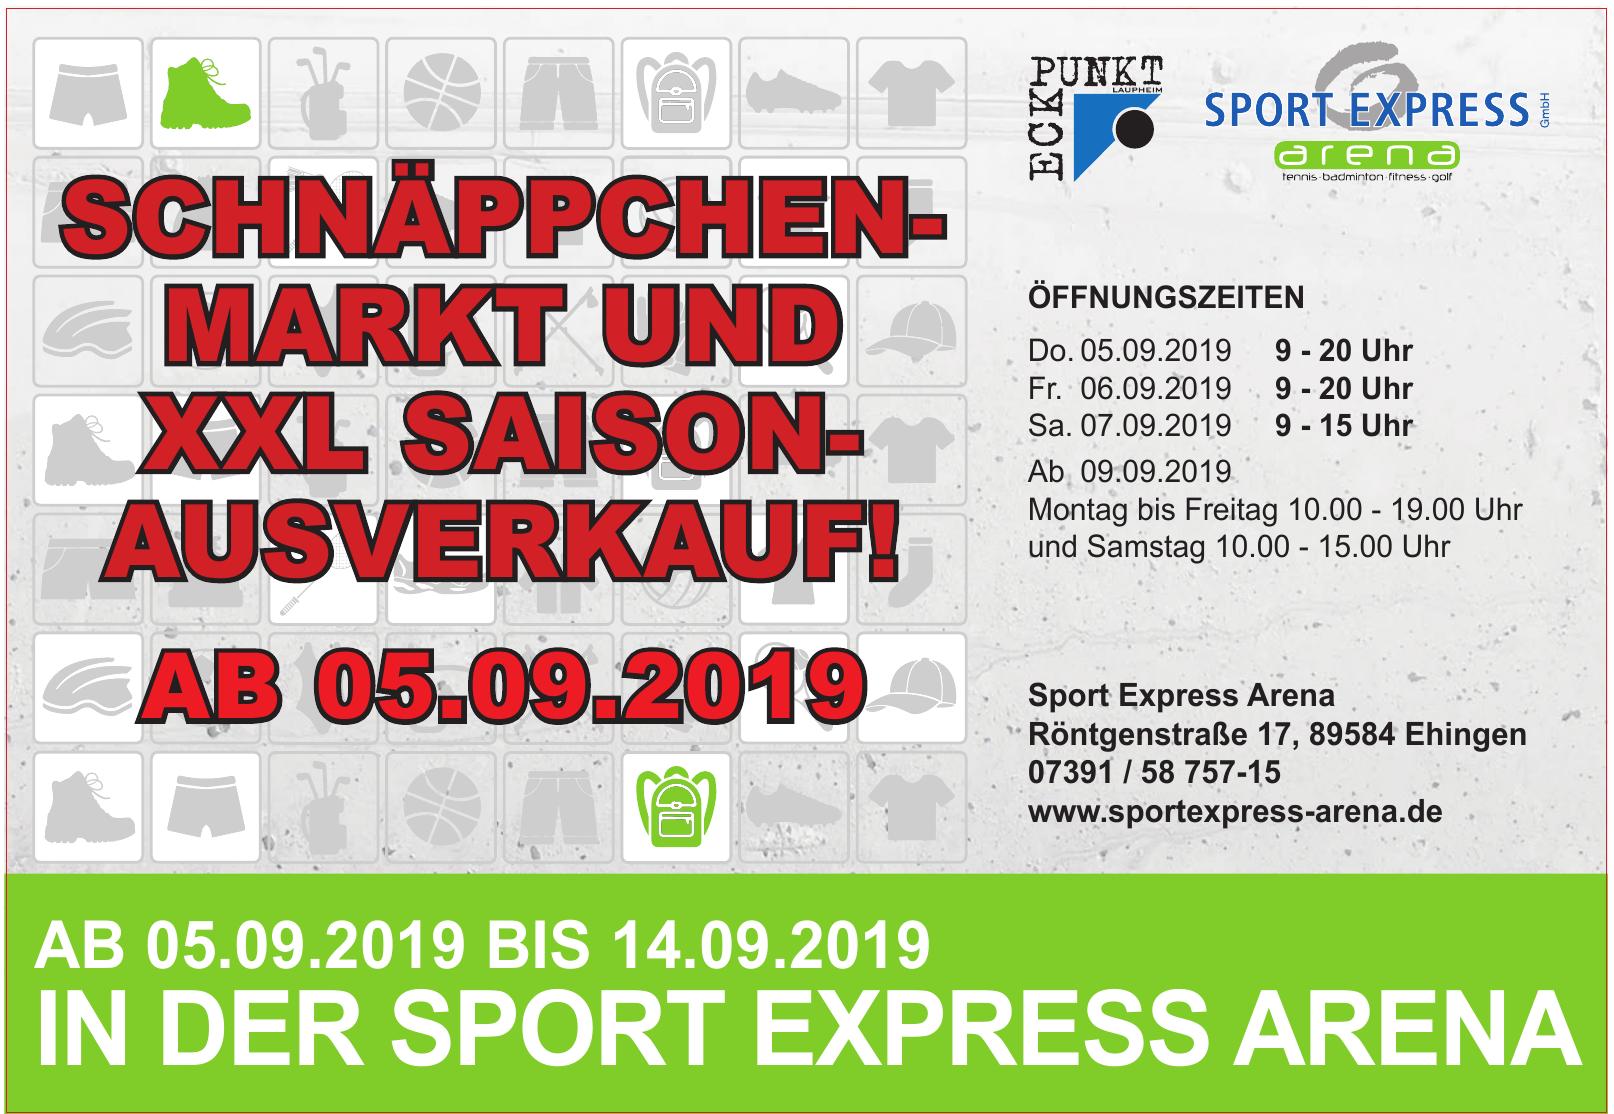 Sport Express Arena